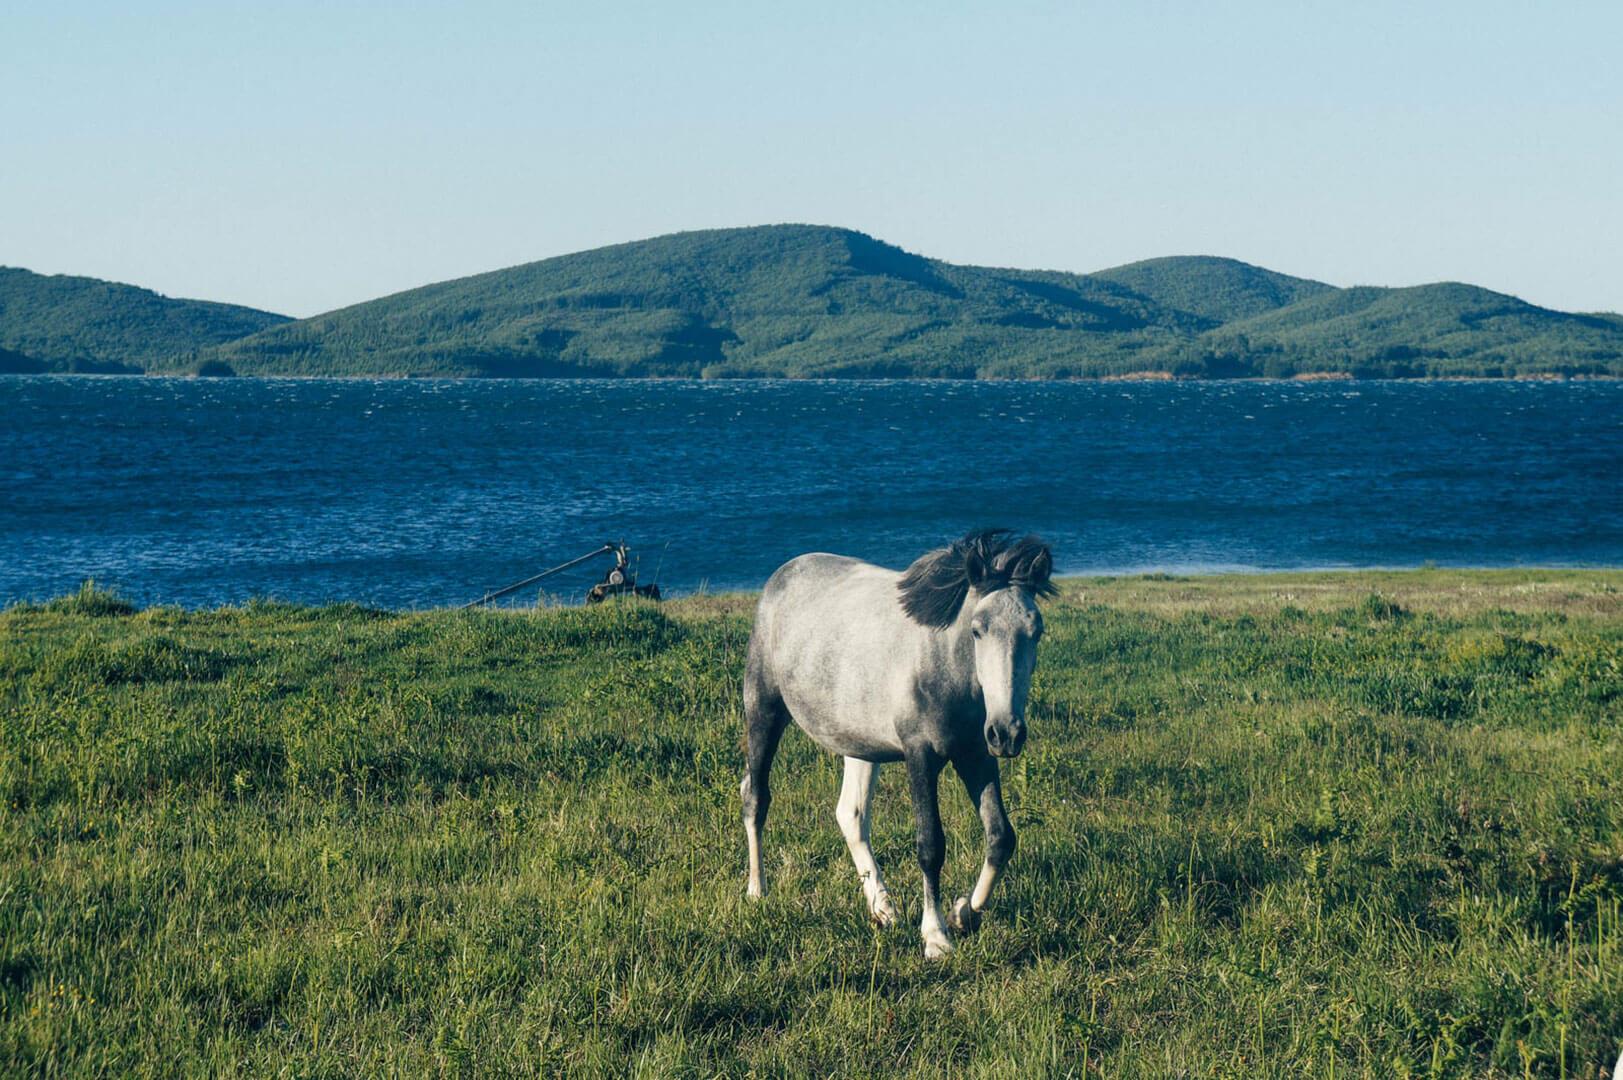 plastira-lake-la-vie-en-blog-all-rights-reserved-4